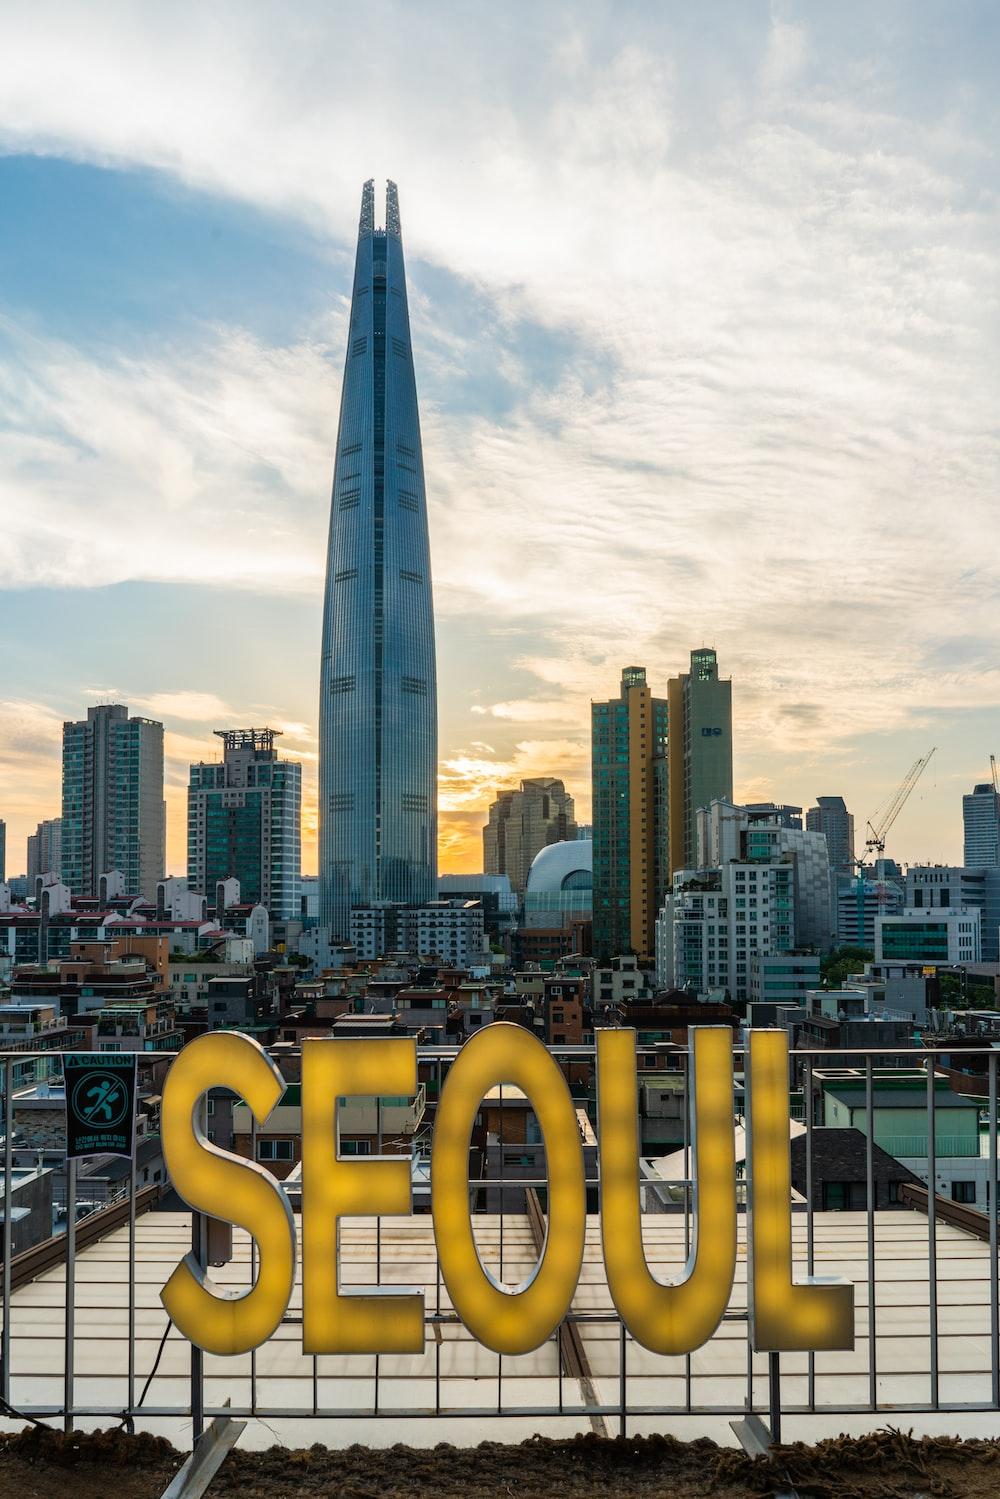 Seoul lighted signage